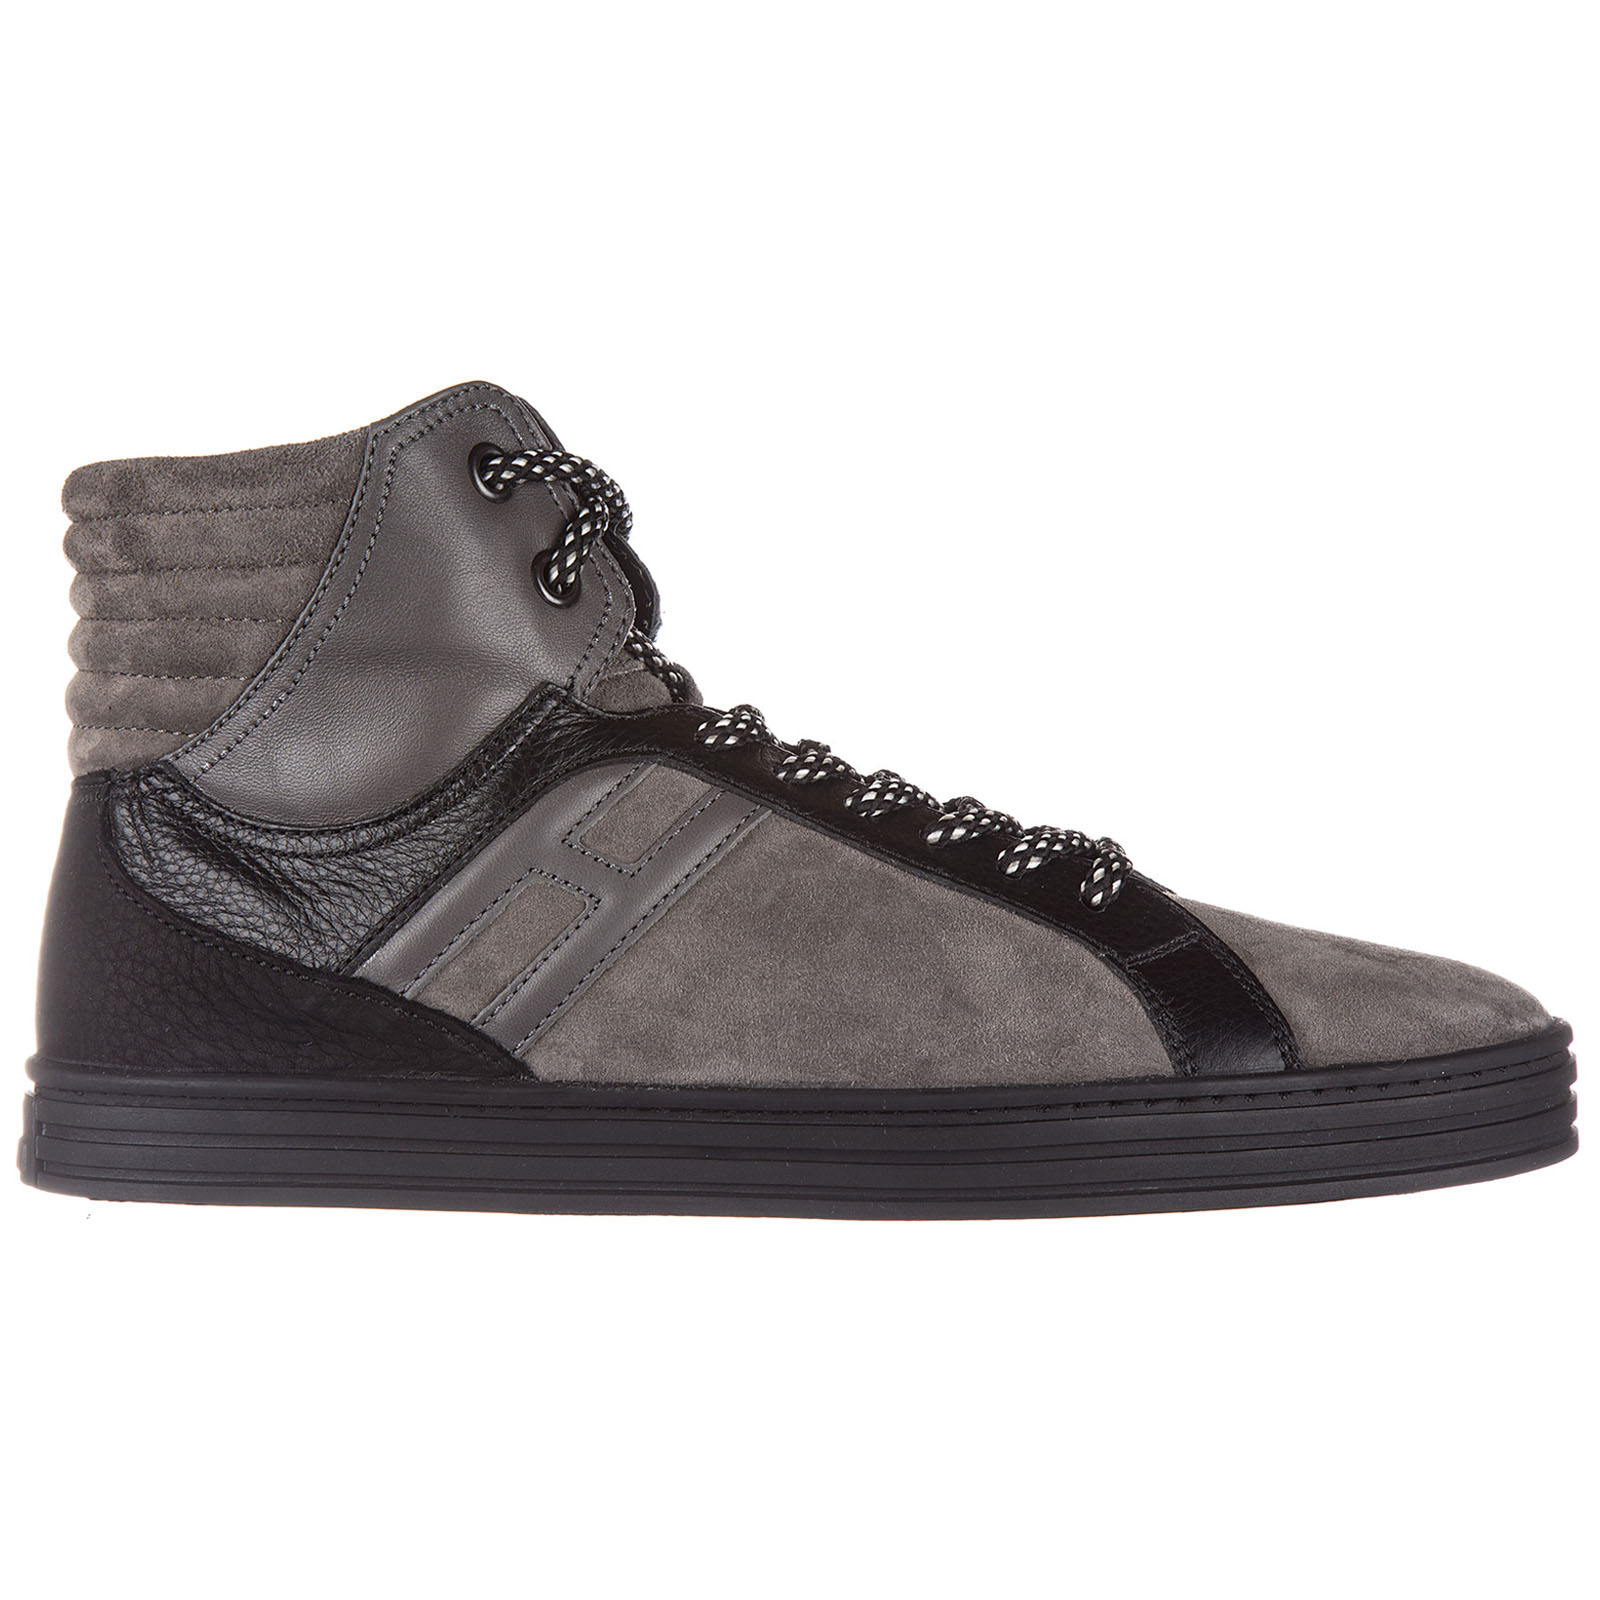 Scarpe sneakers alte uomo in camoscio r141 basket